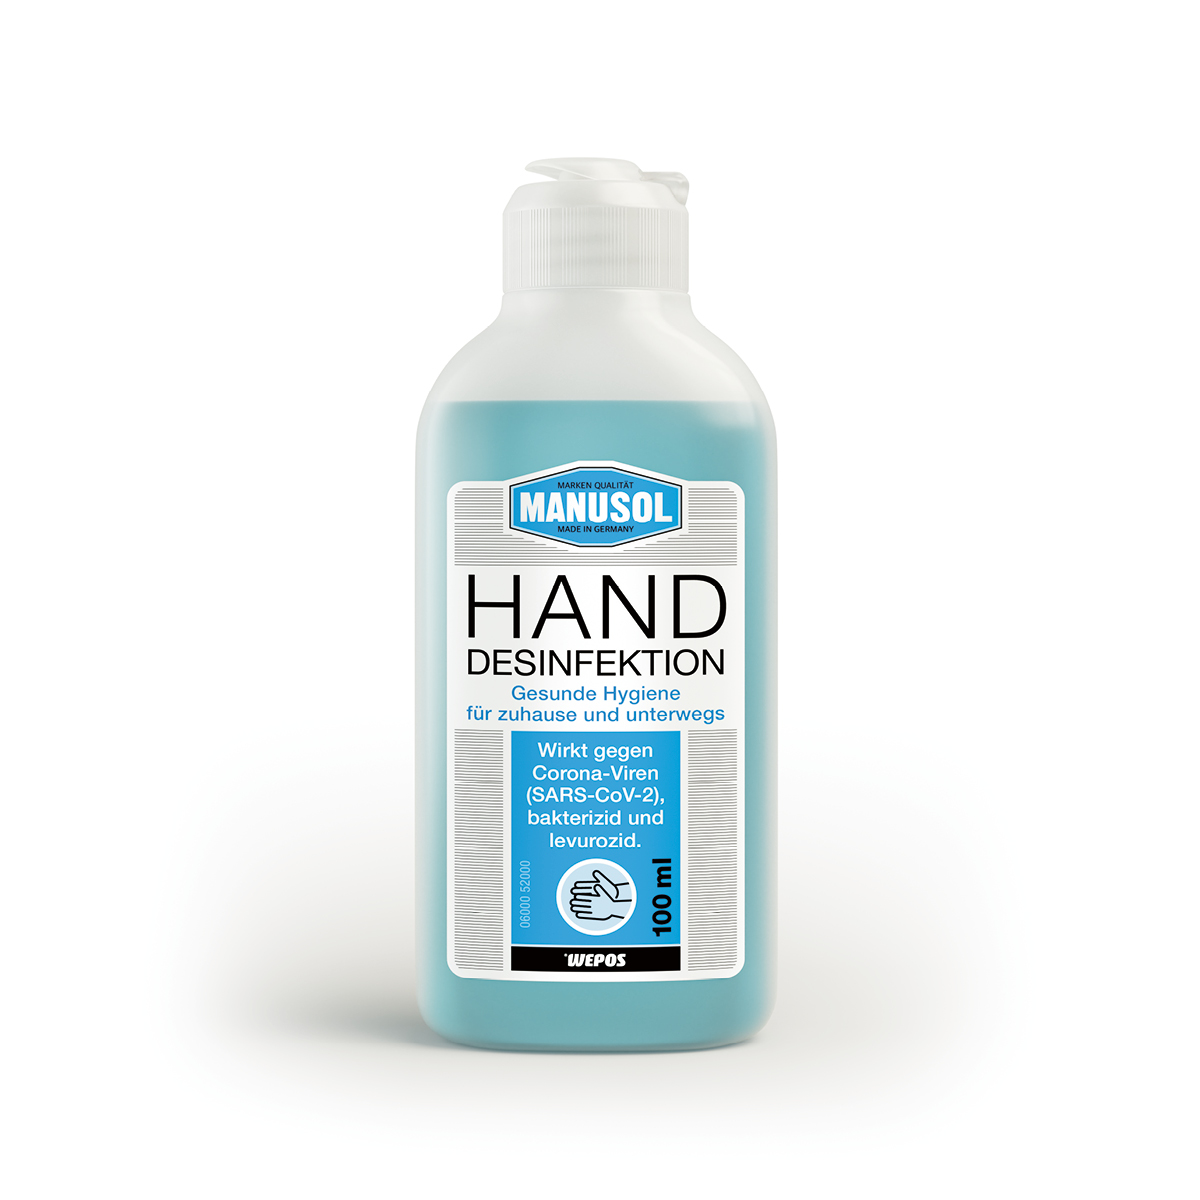 Manusol Hand Desinfektion